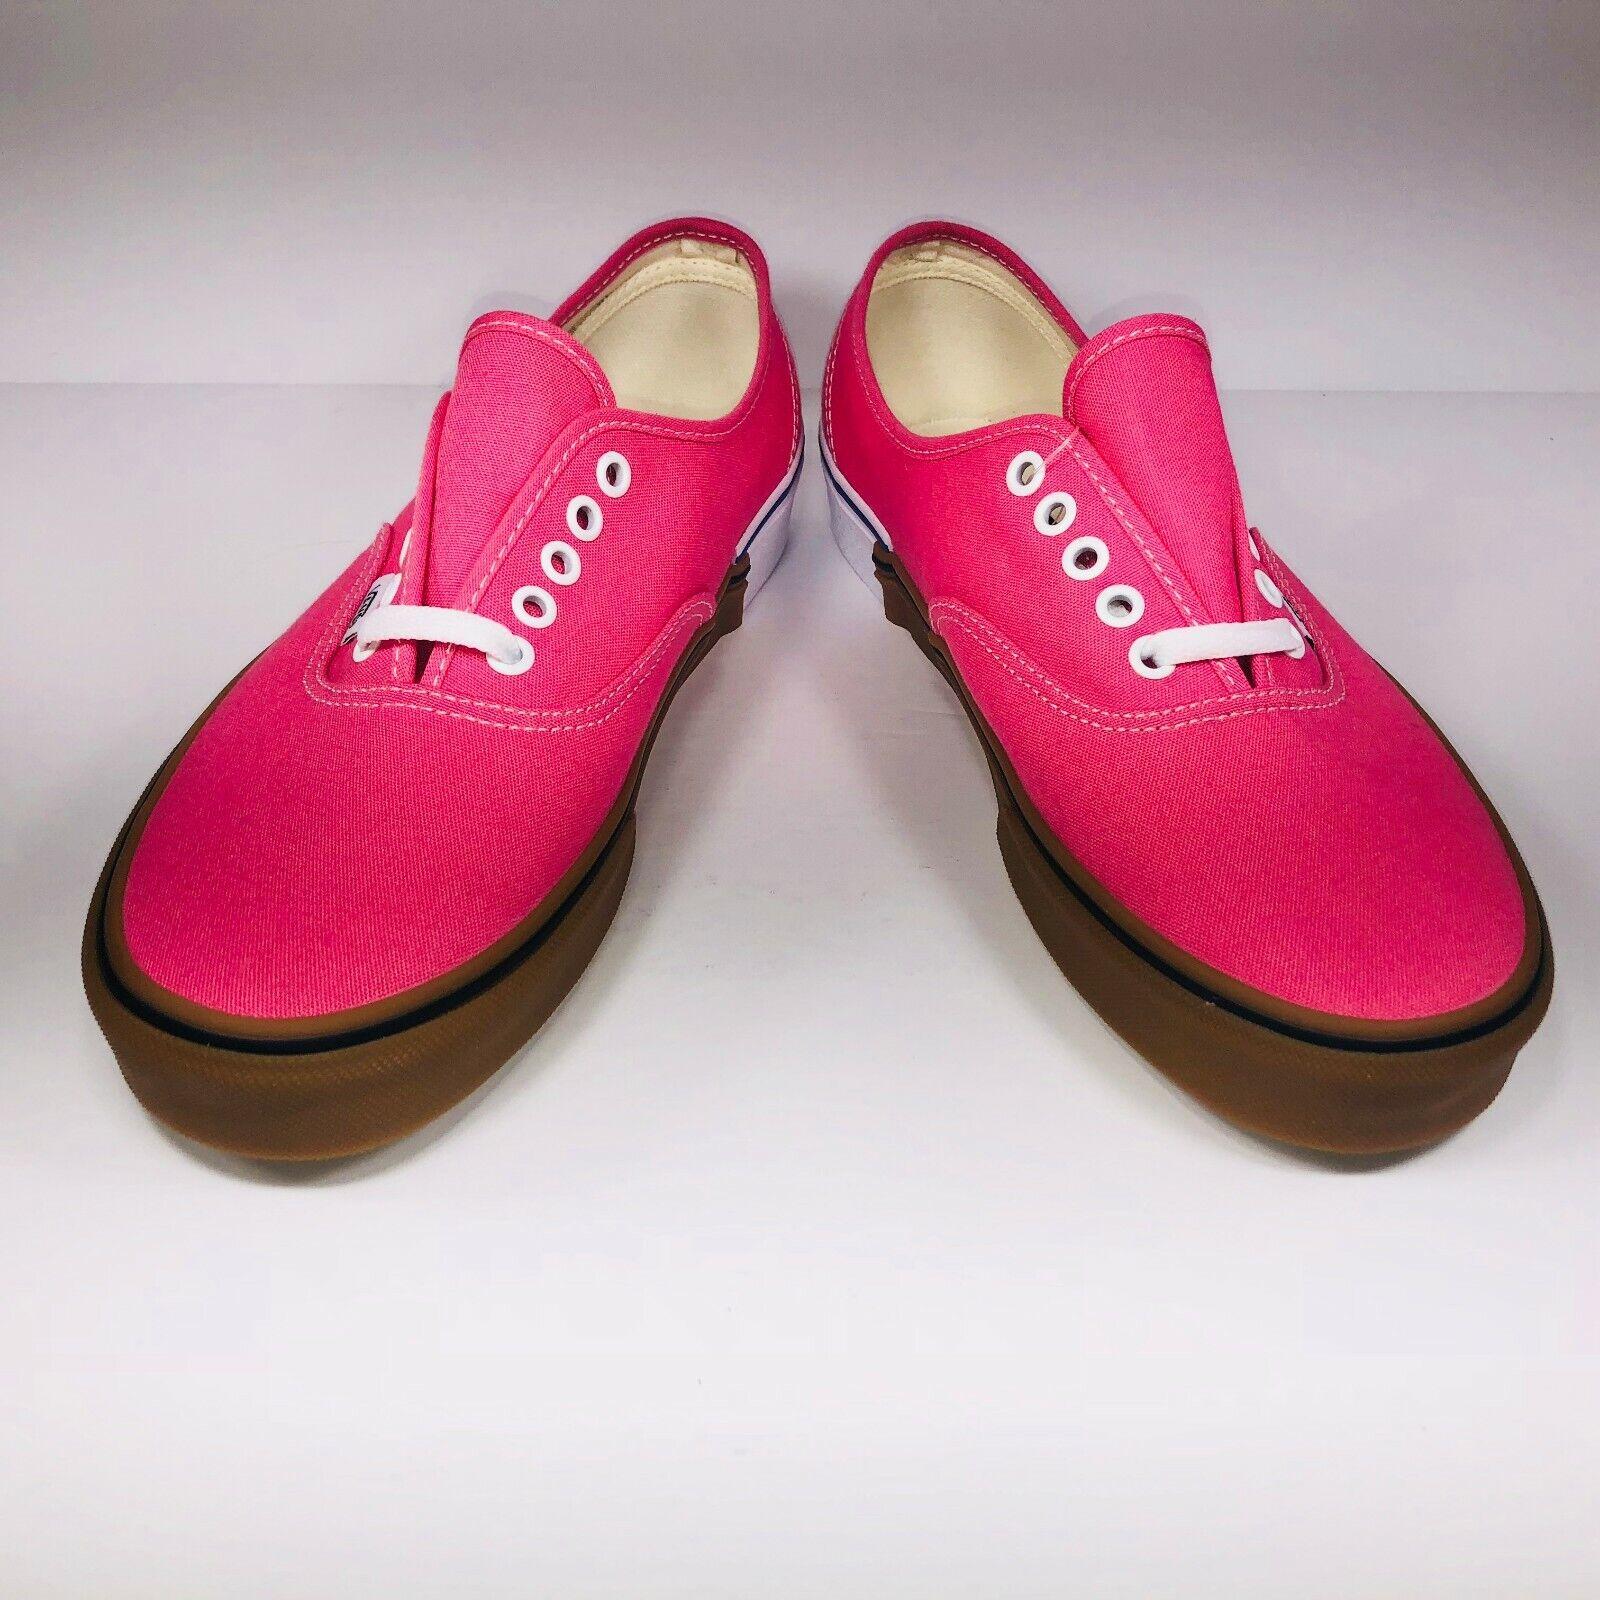 VANS Authentic Gum Block Pink Lemonade White Sneakers Sneakers Sneakers VN0A38EMUKD Size 9.5 7fee9e